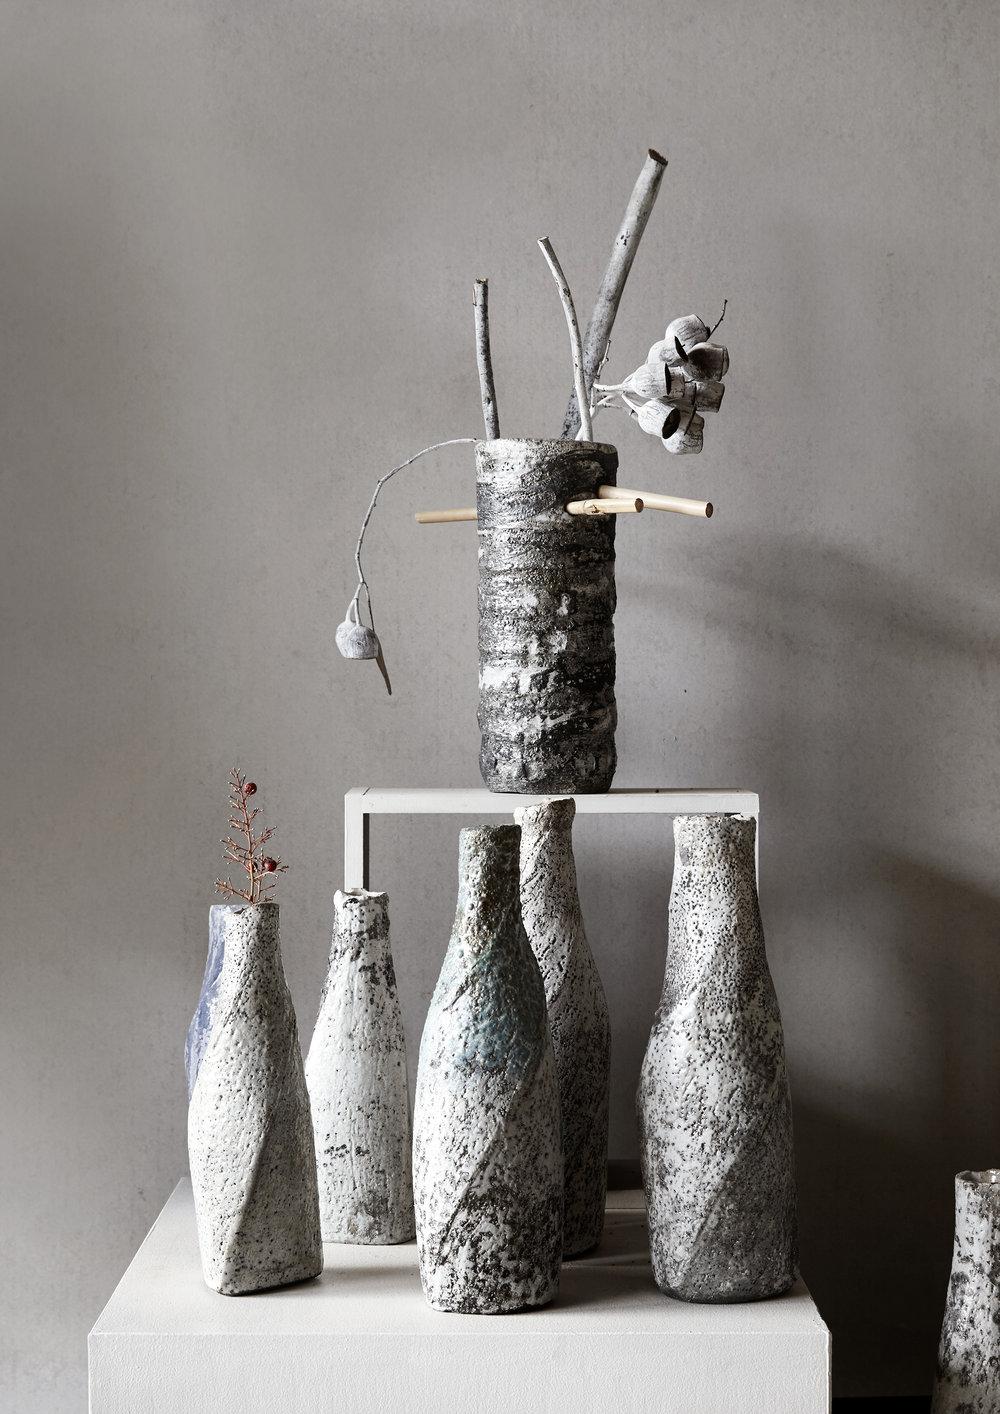 Japanese Raku-fired vases #beautiful